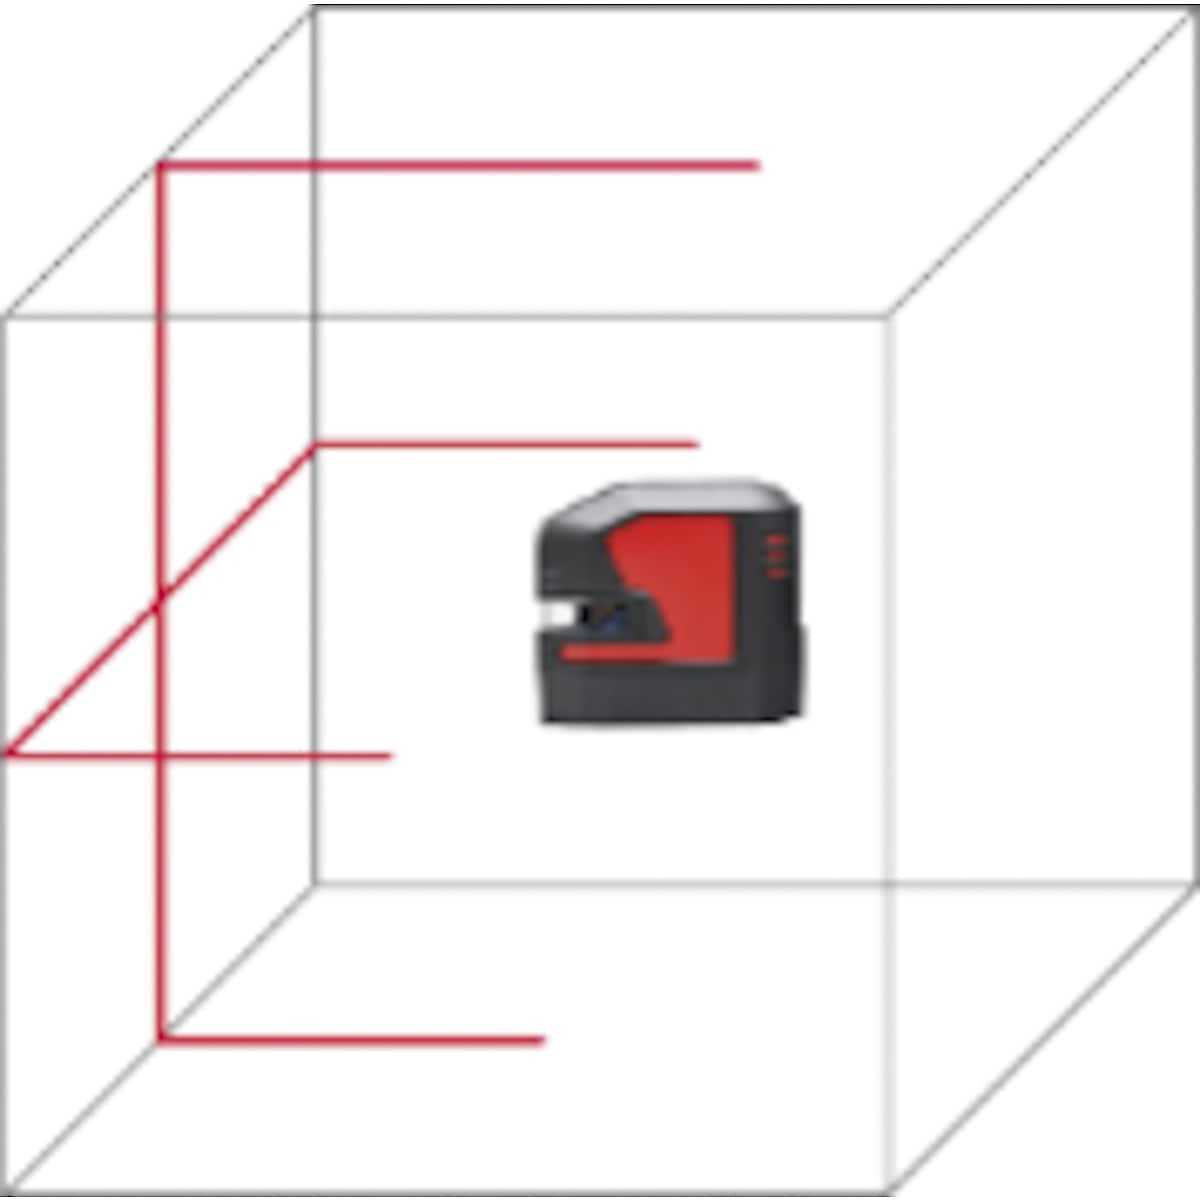 Leica Lino L2 krysslaser